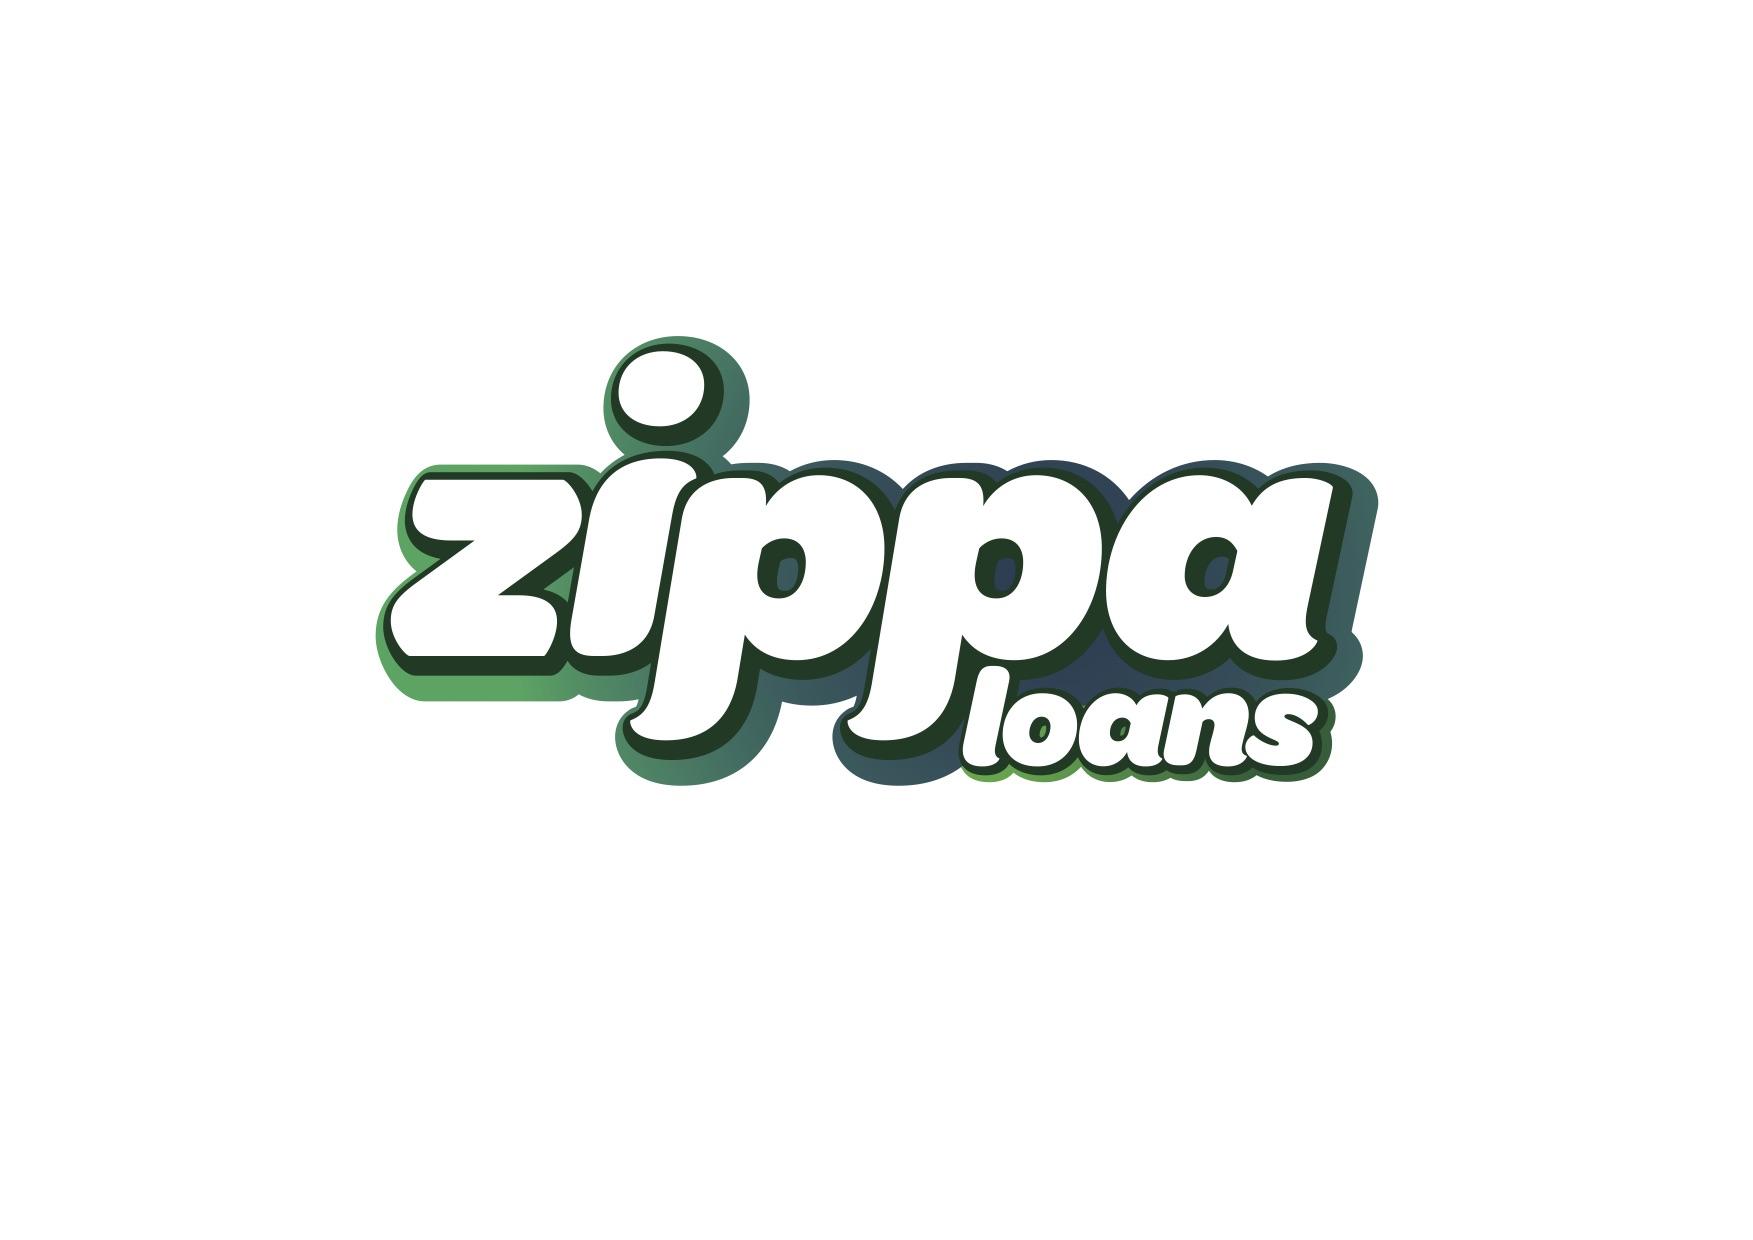 Zippa-logo